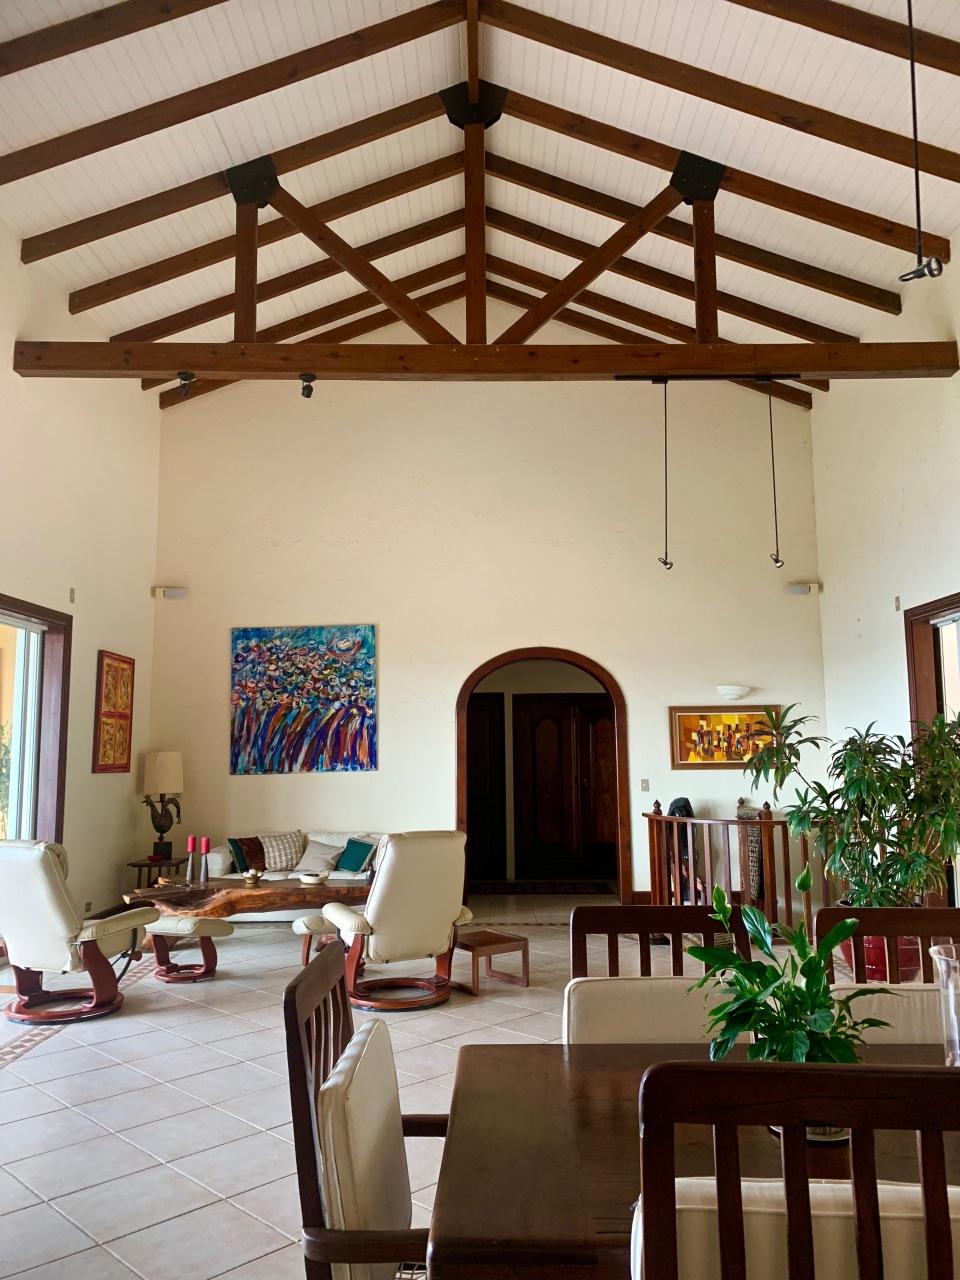 Old Spanish home decor